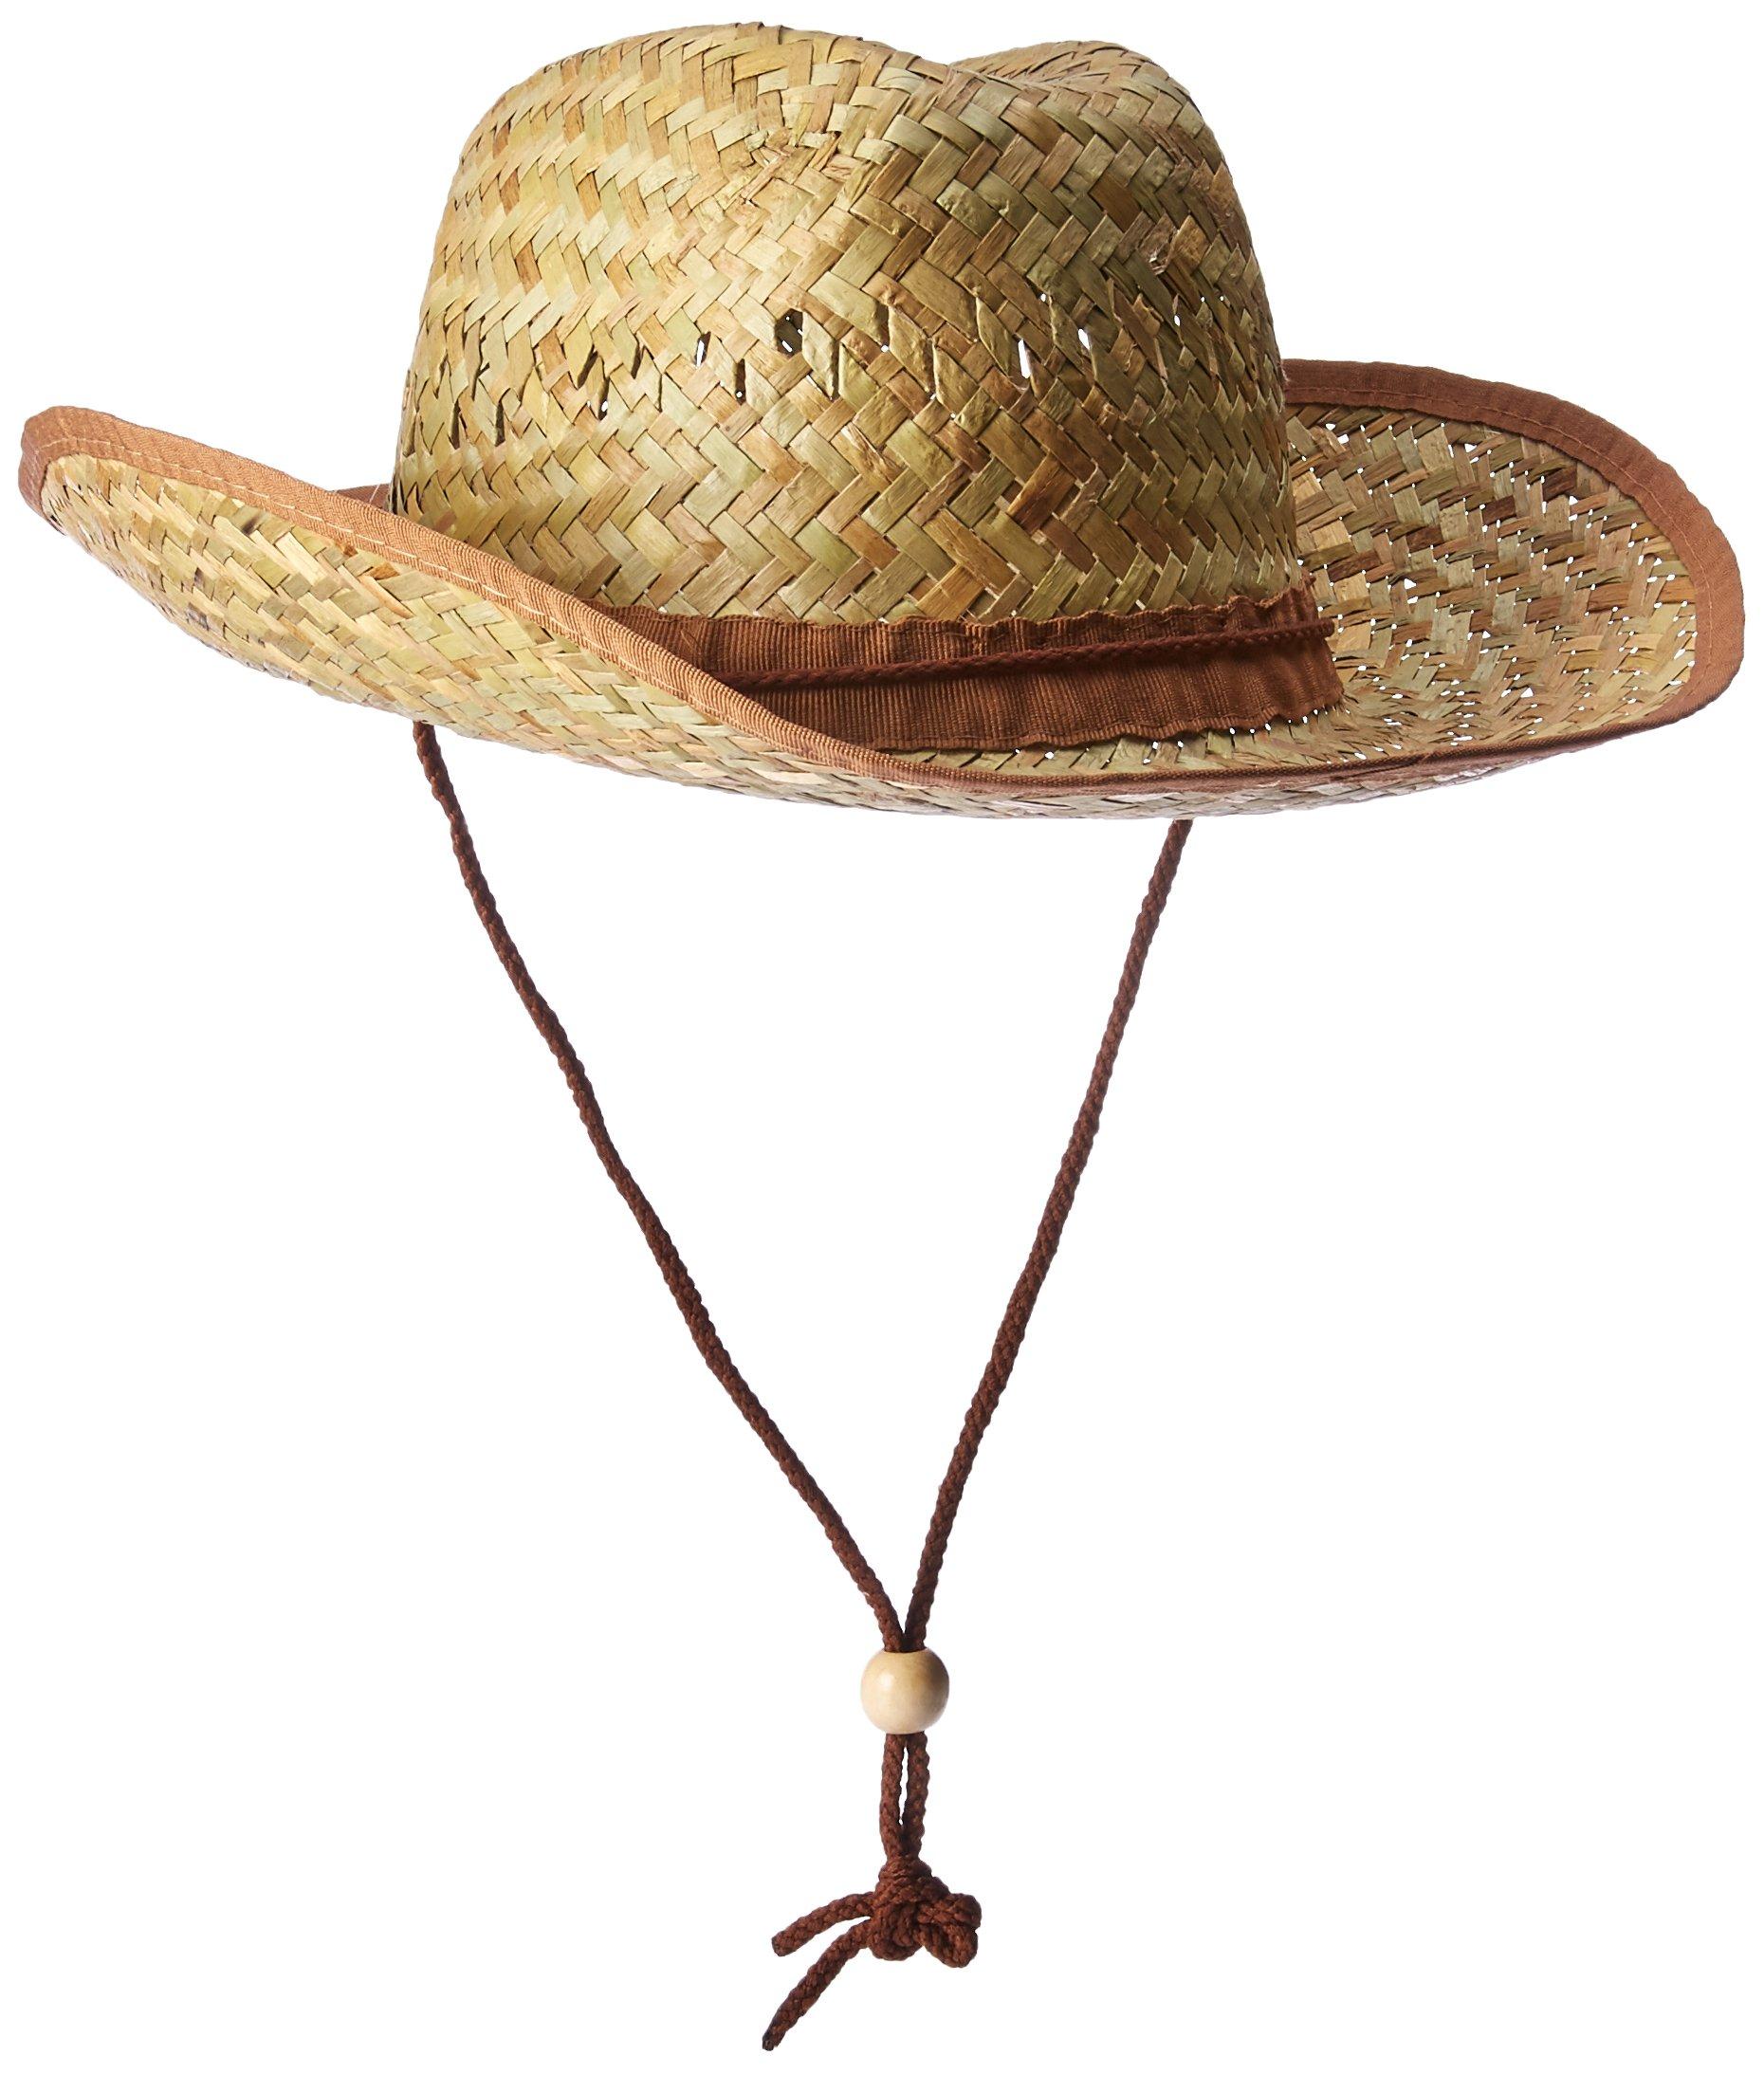 Amscan Beach Bum Cowboy Hat Hawaiian Summer Luau Costume Dress up Party Headwear, Straw, 10'' x 15'' x 5''. Childrens (6 Piece)